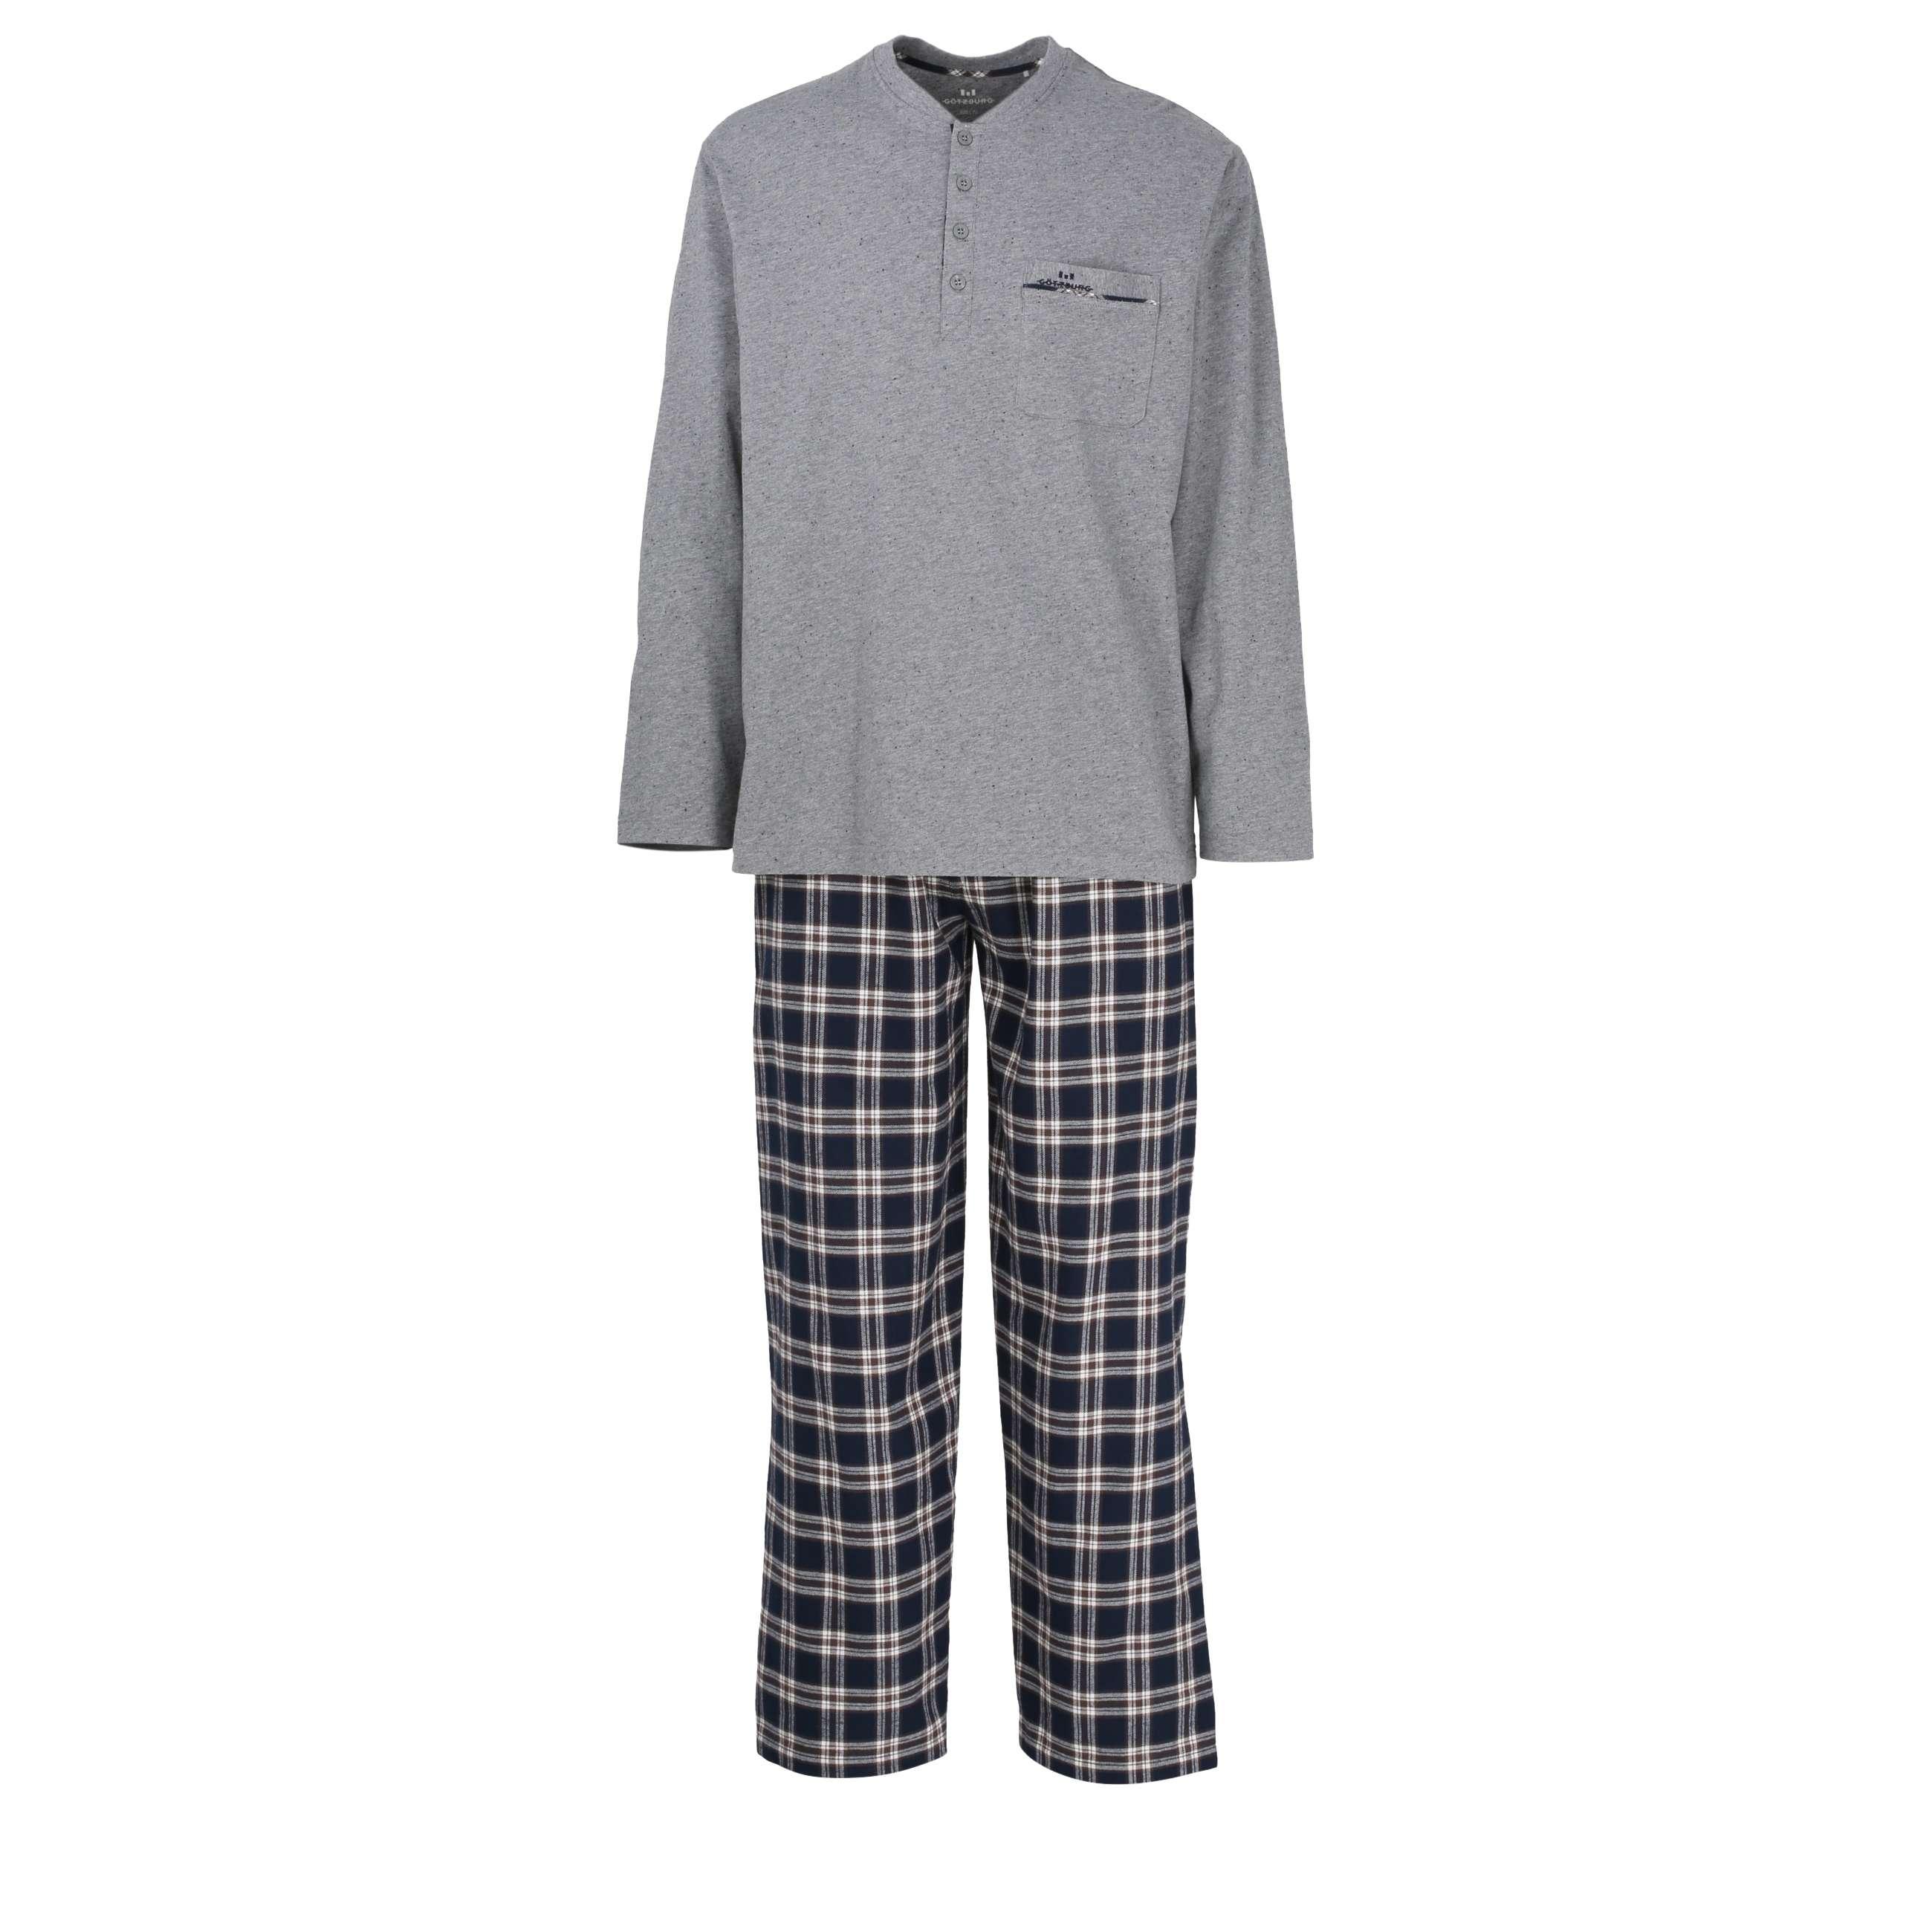 g tzburg herren pyjama schlafanzug kariert. Black Bedroom Furniture Sets. Home Design Ideas